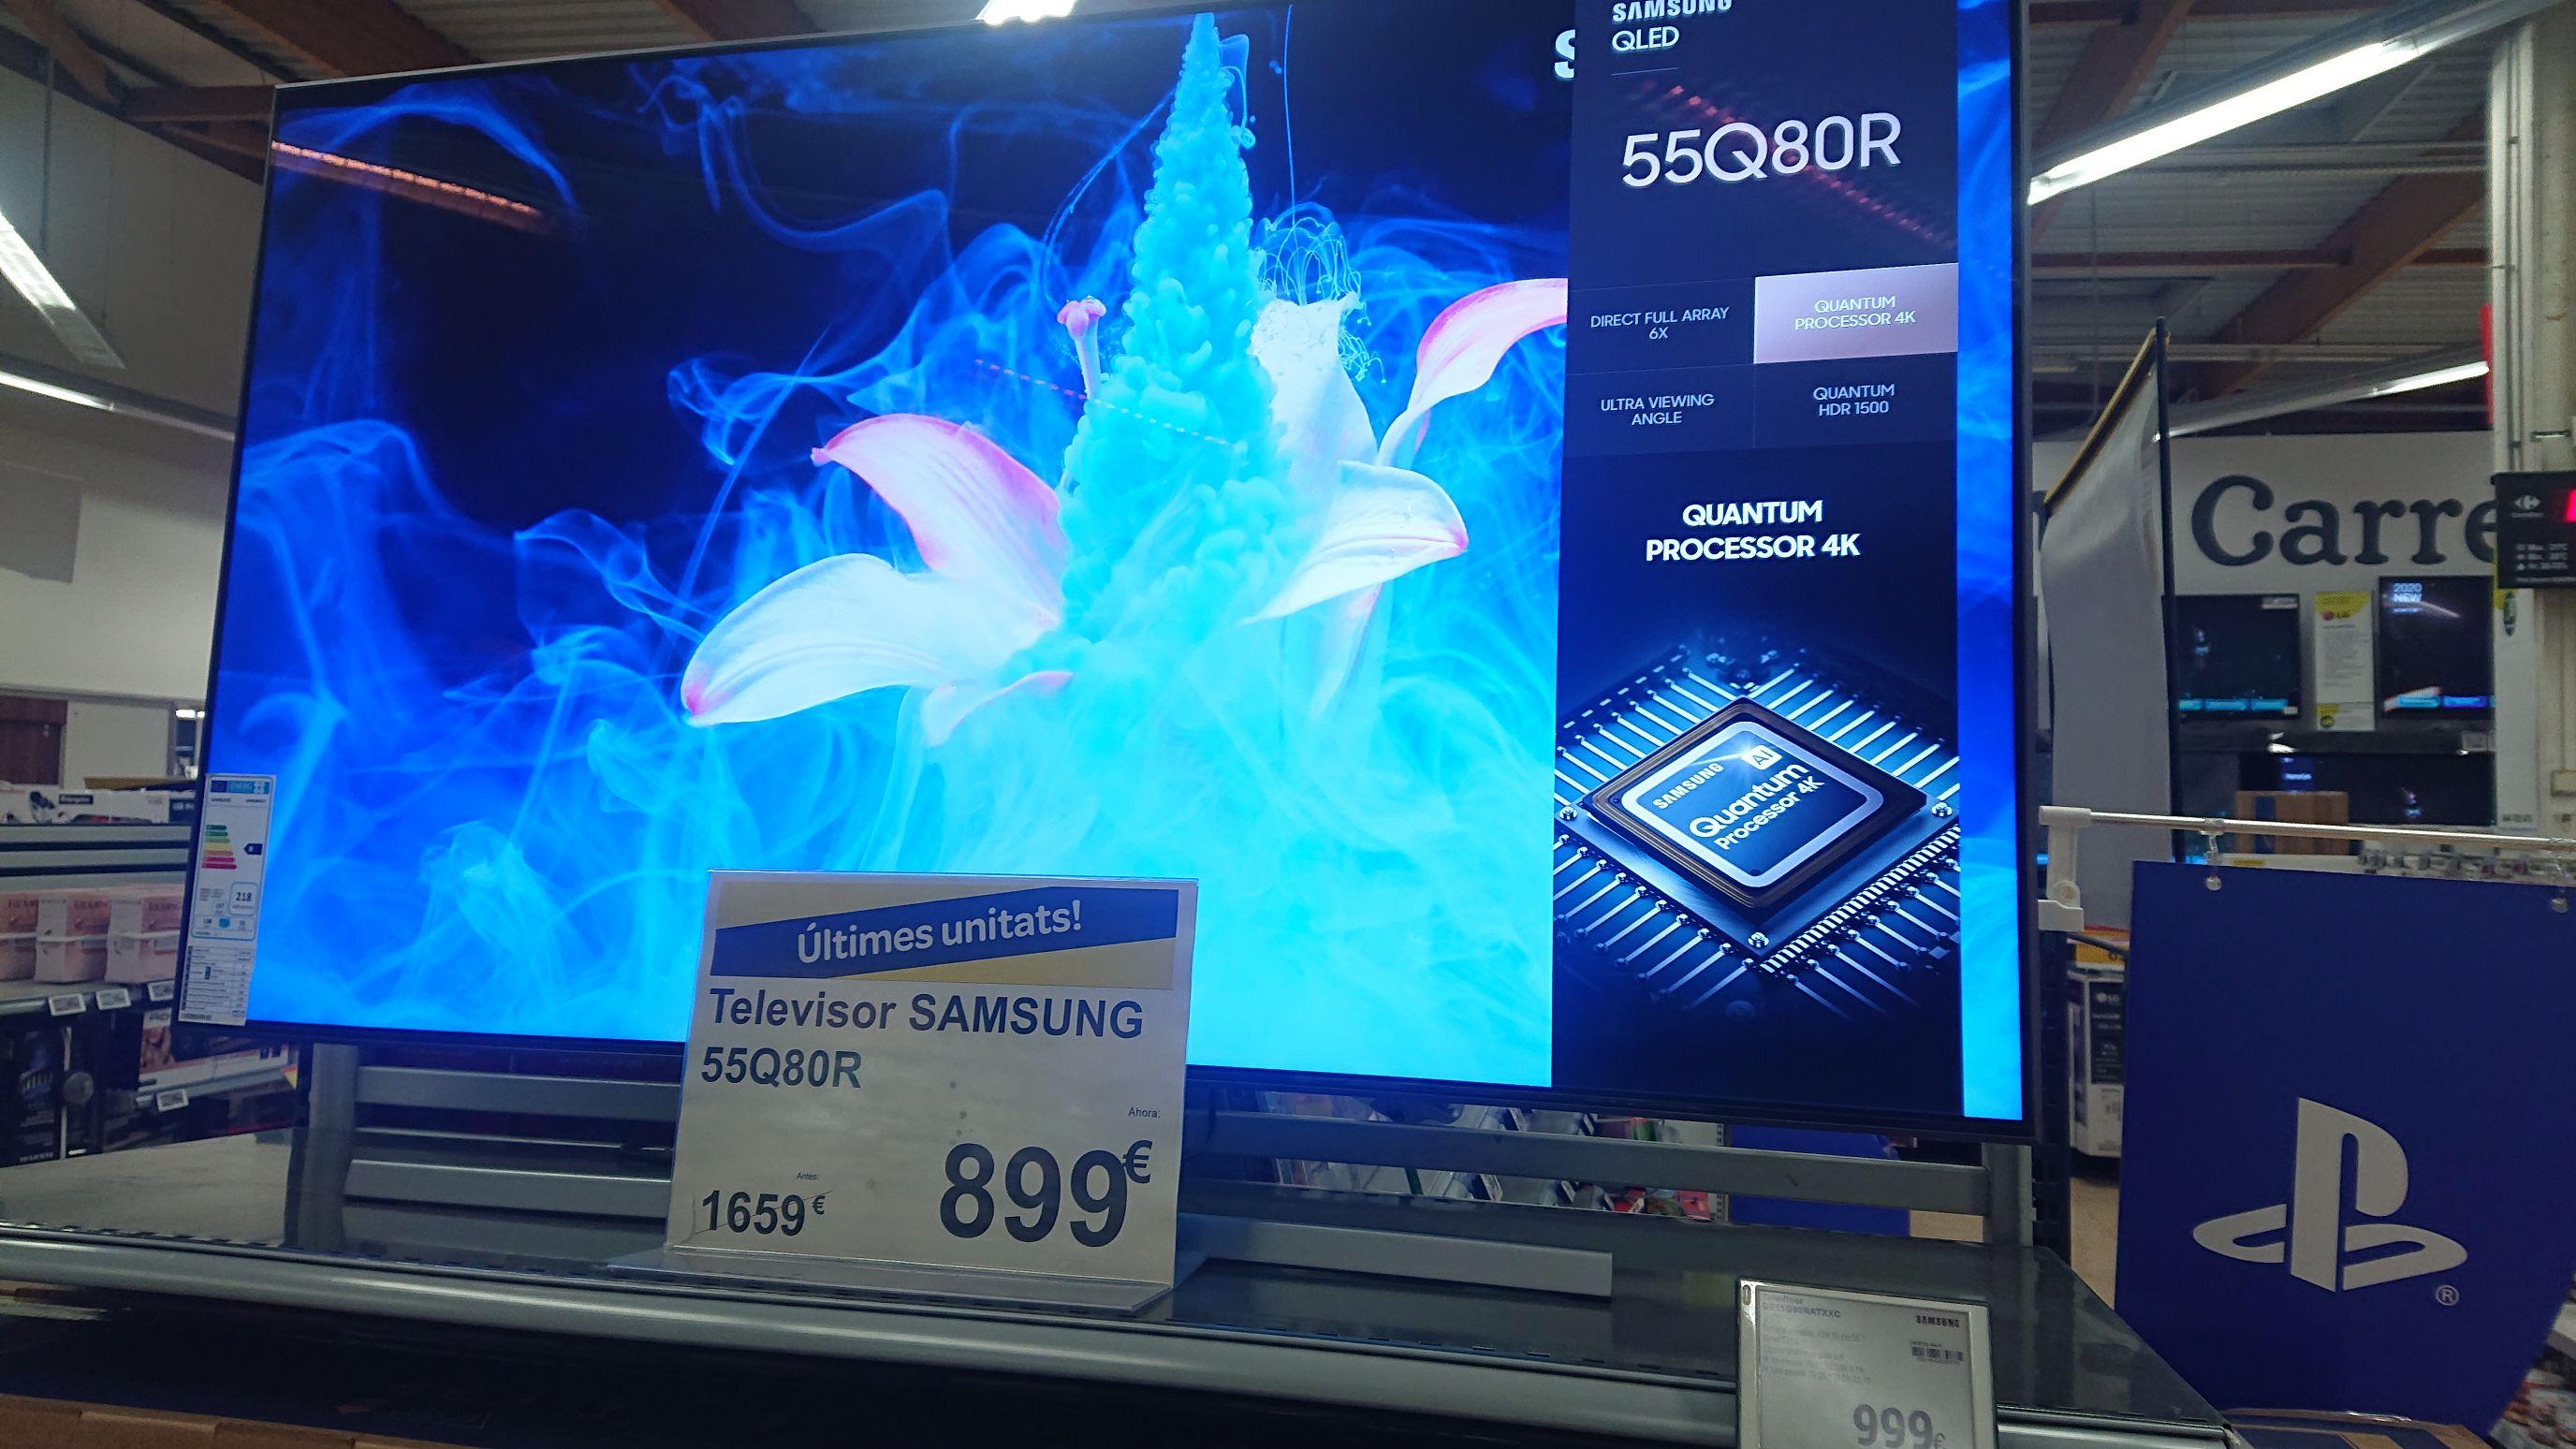 TV Samsung Qled 55Q80R en Carrefour Vic